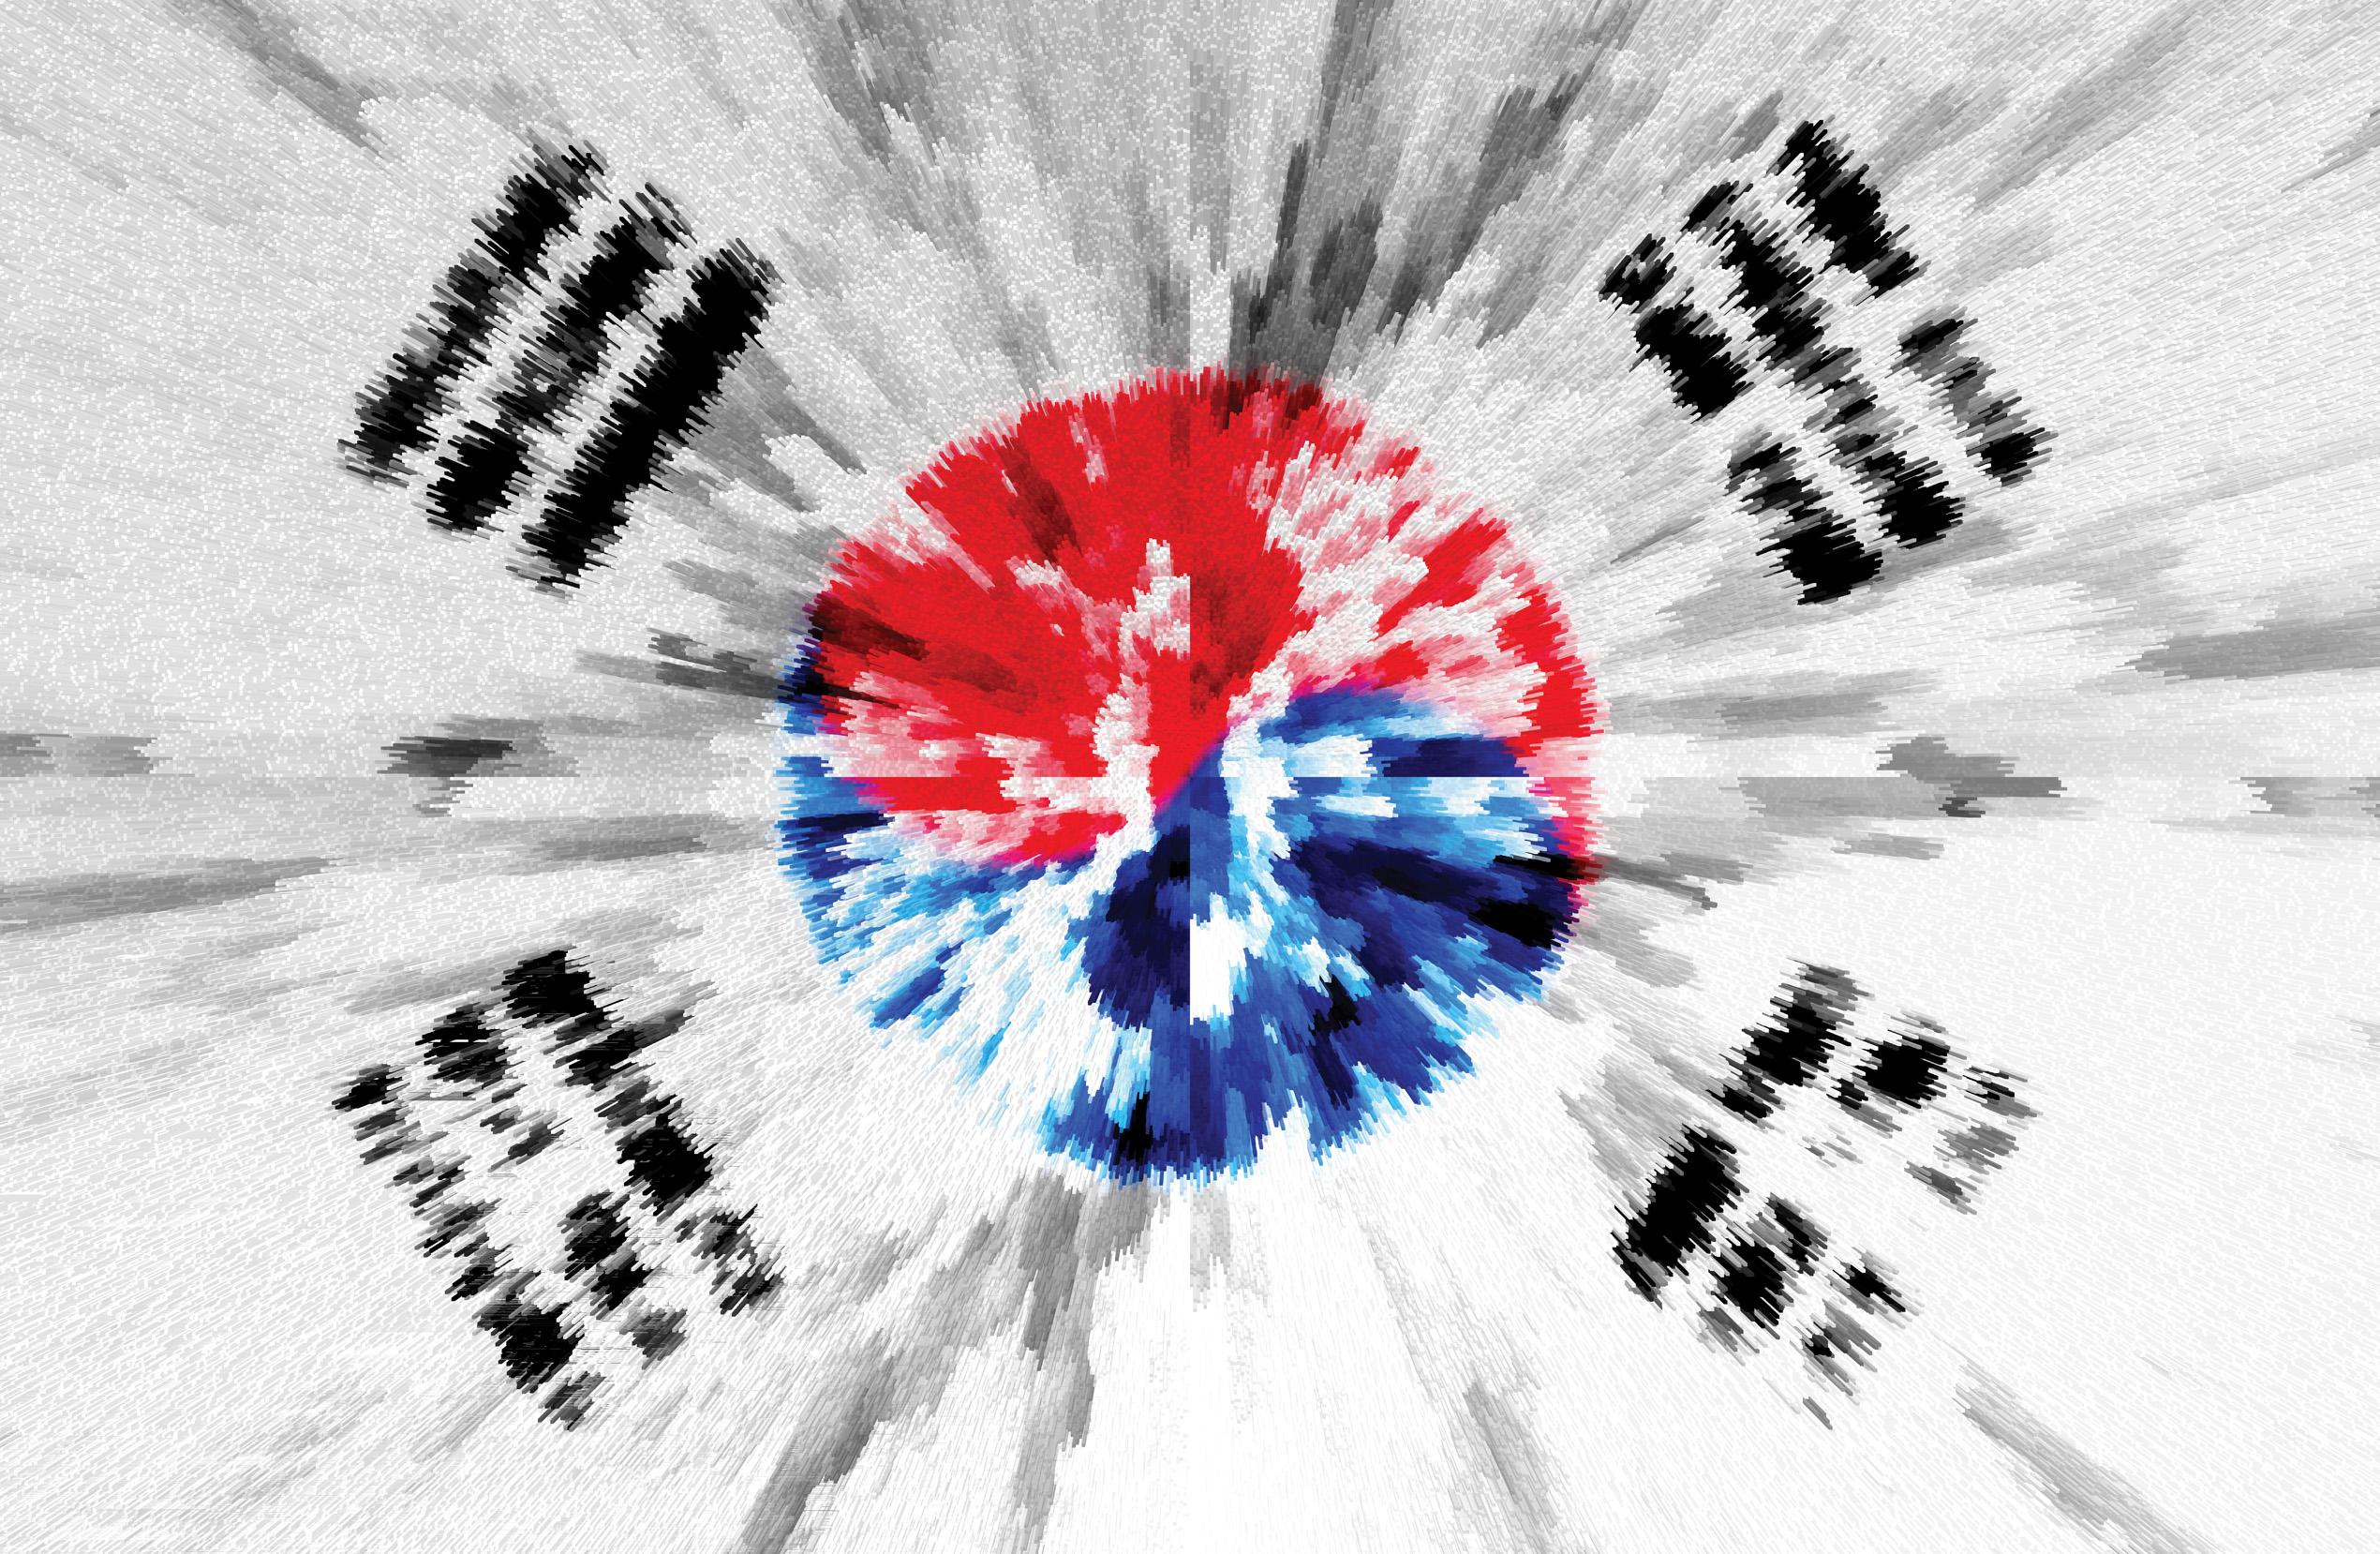 South korean flag hd wallpaper background image 2540x1658 id 896462 wallpaper abyss - South korea wallpaper hd ...